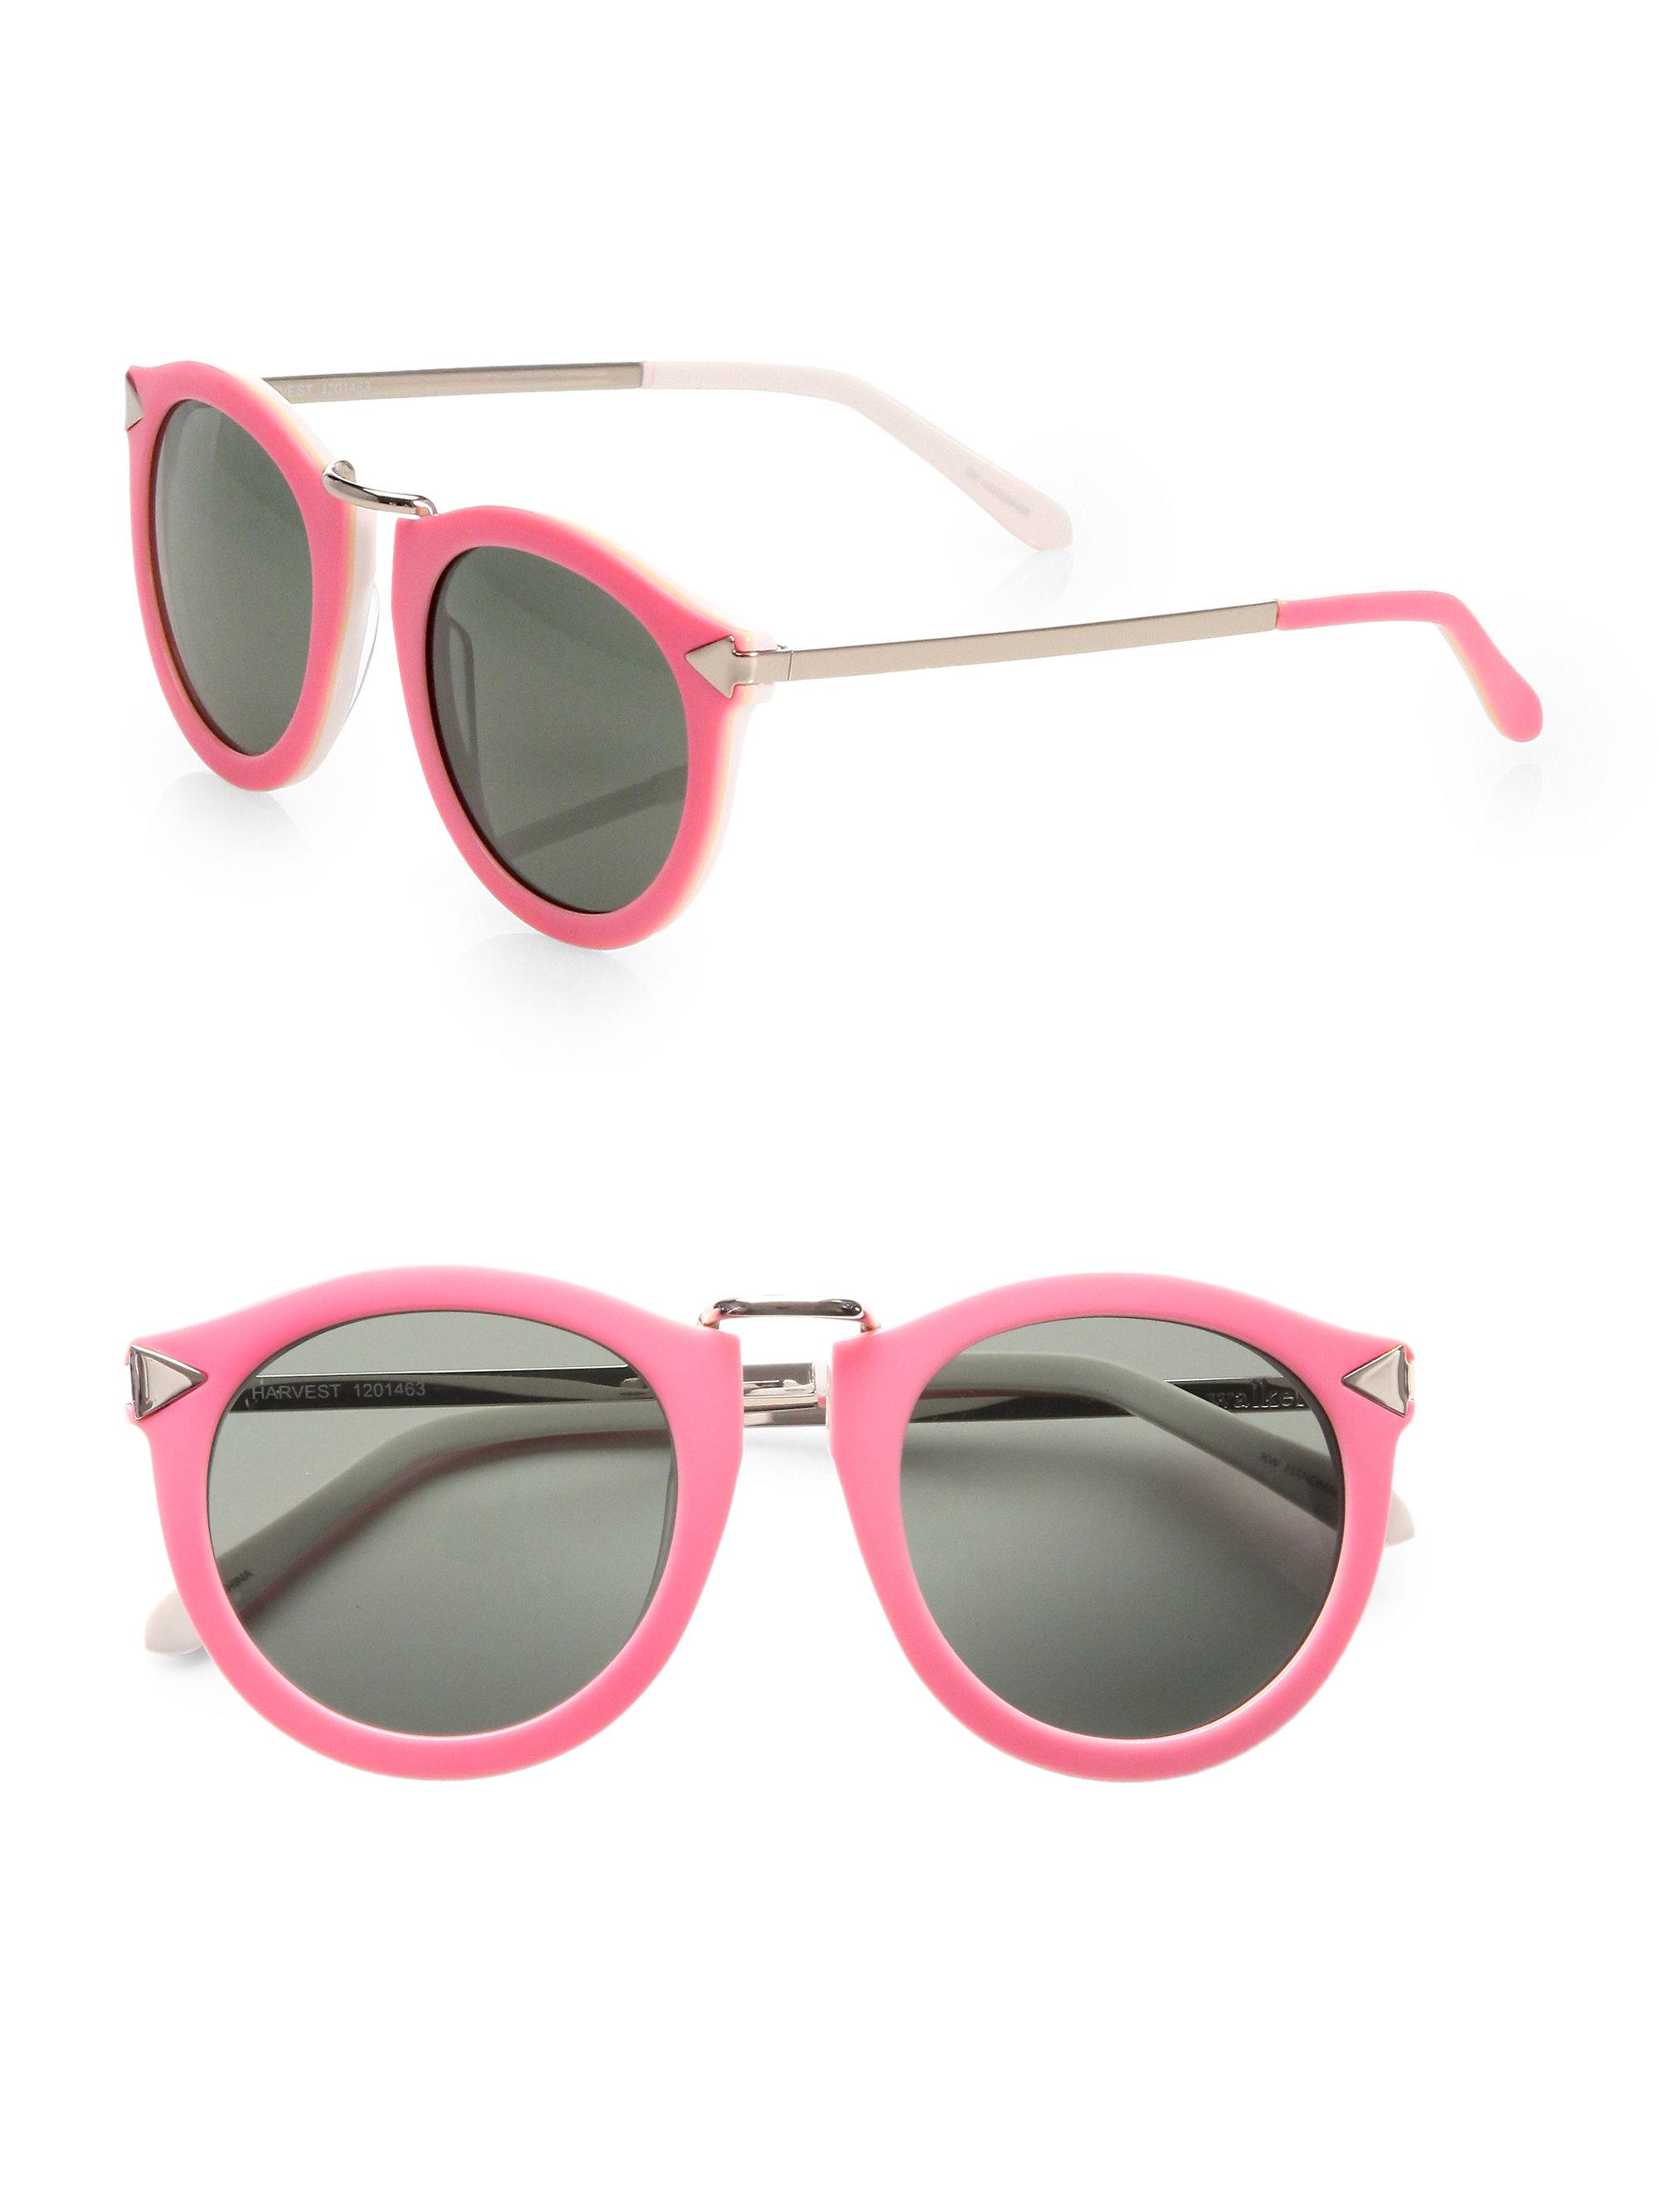 241c059717fe Lyst - Karen Walker Harvest Round Acetate Sunglasses in Pink